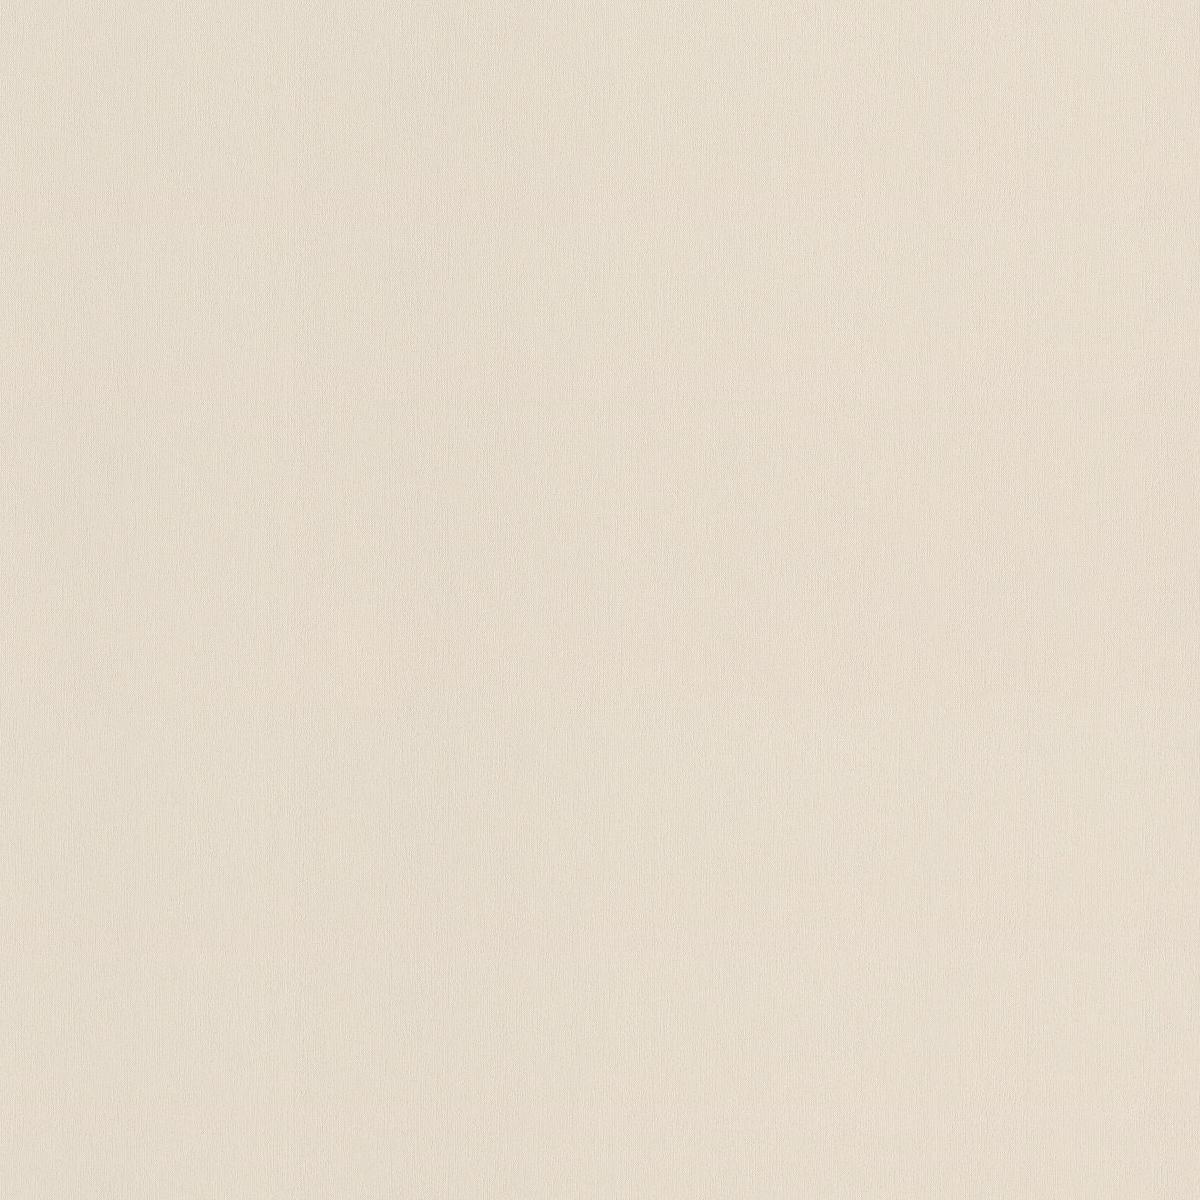 Обои флизелиновые Rasch Harmony бежевые 1.06 м 948721